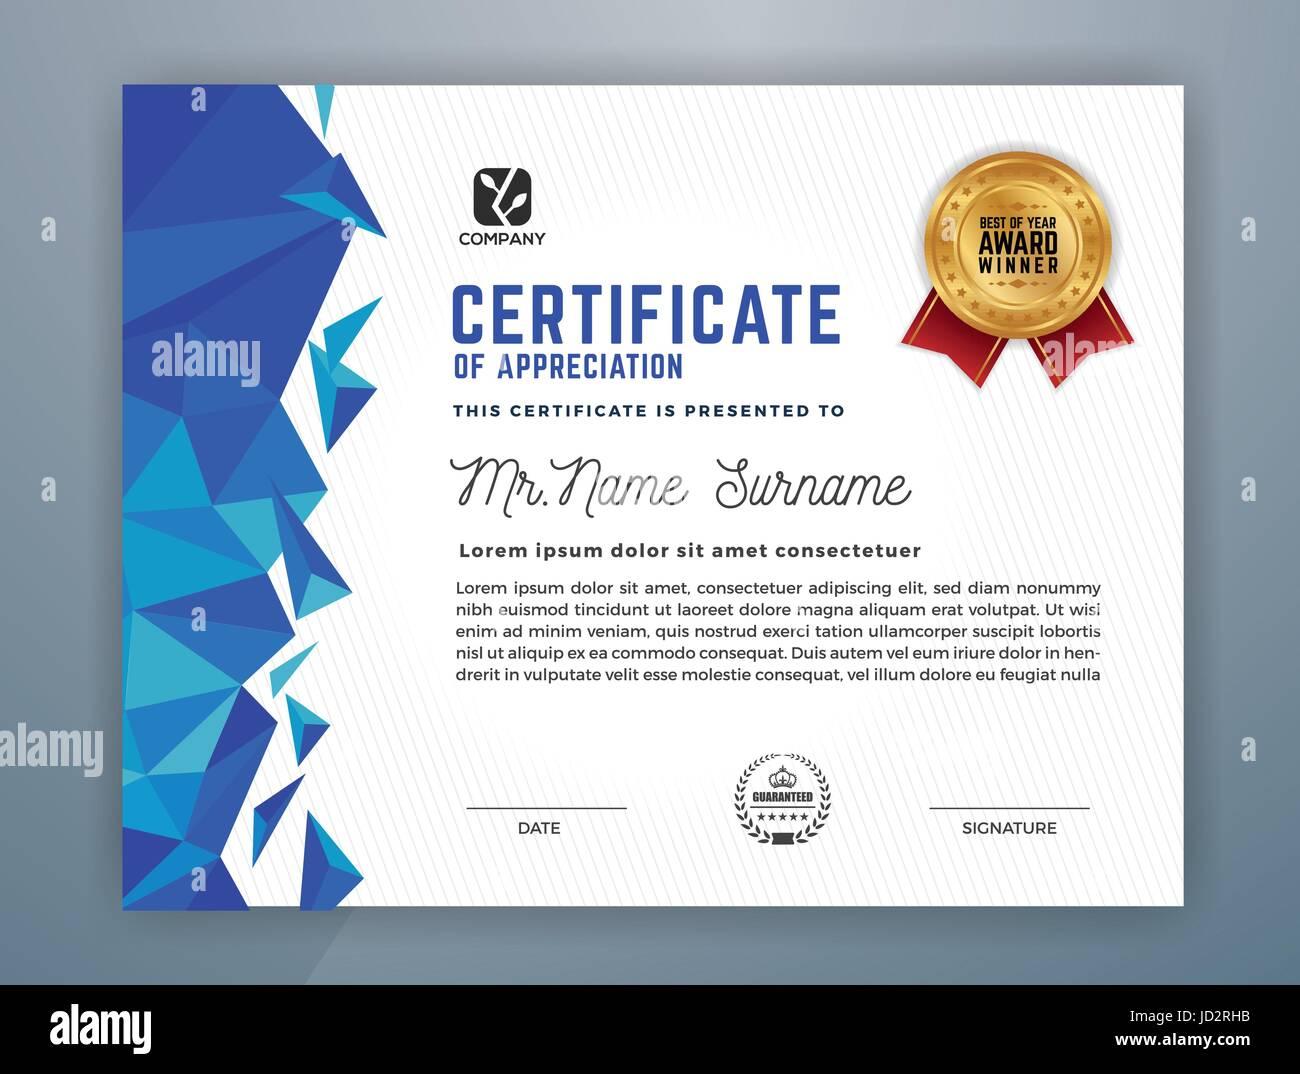 Multipurpose modern professional certificate template design for multipurpose modern professional certificate template design for print vector illustration 1betcityfo Gallery